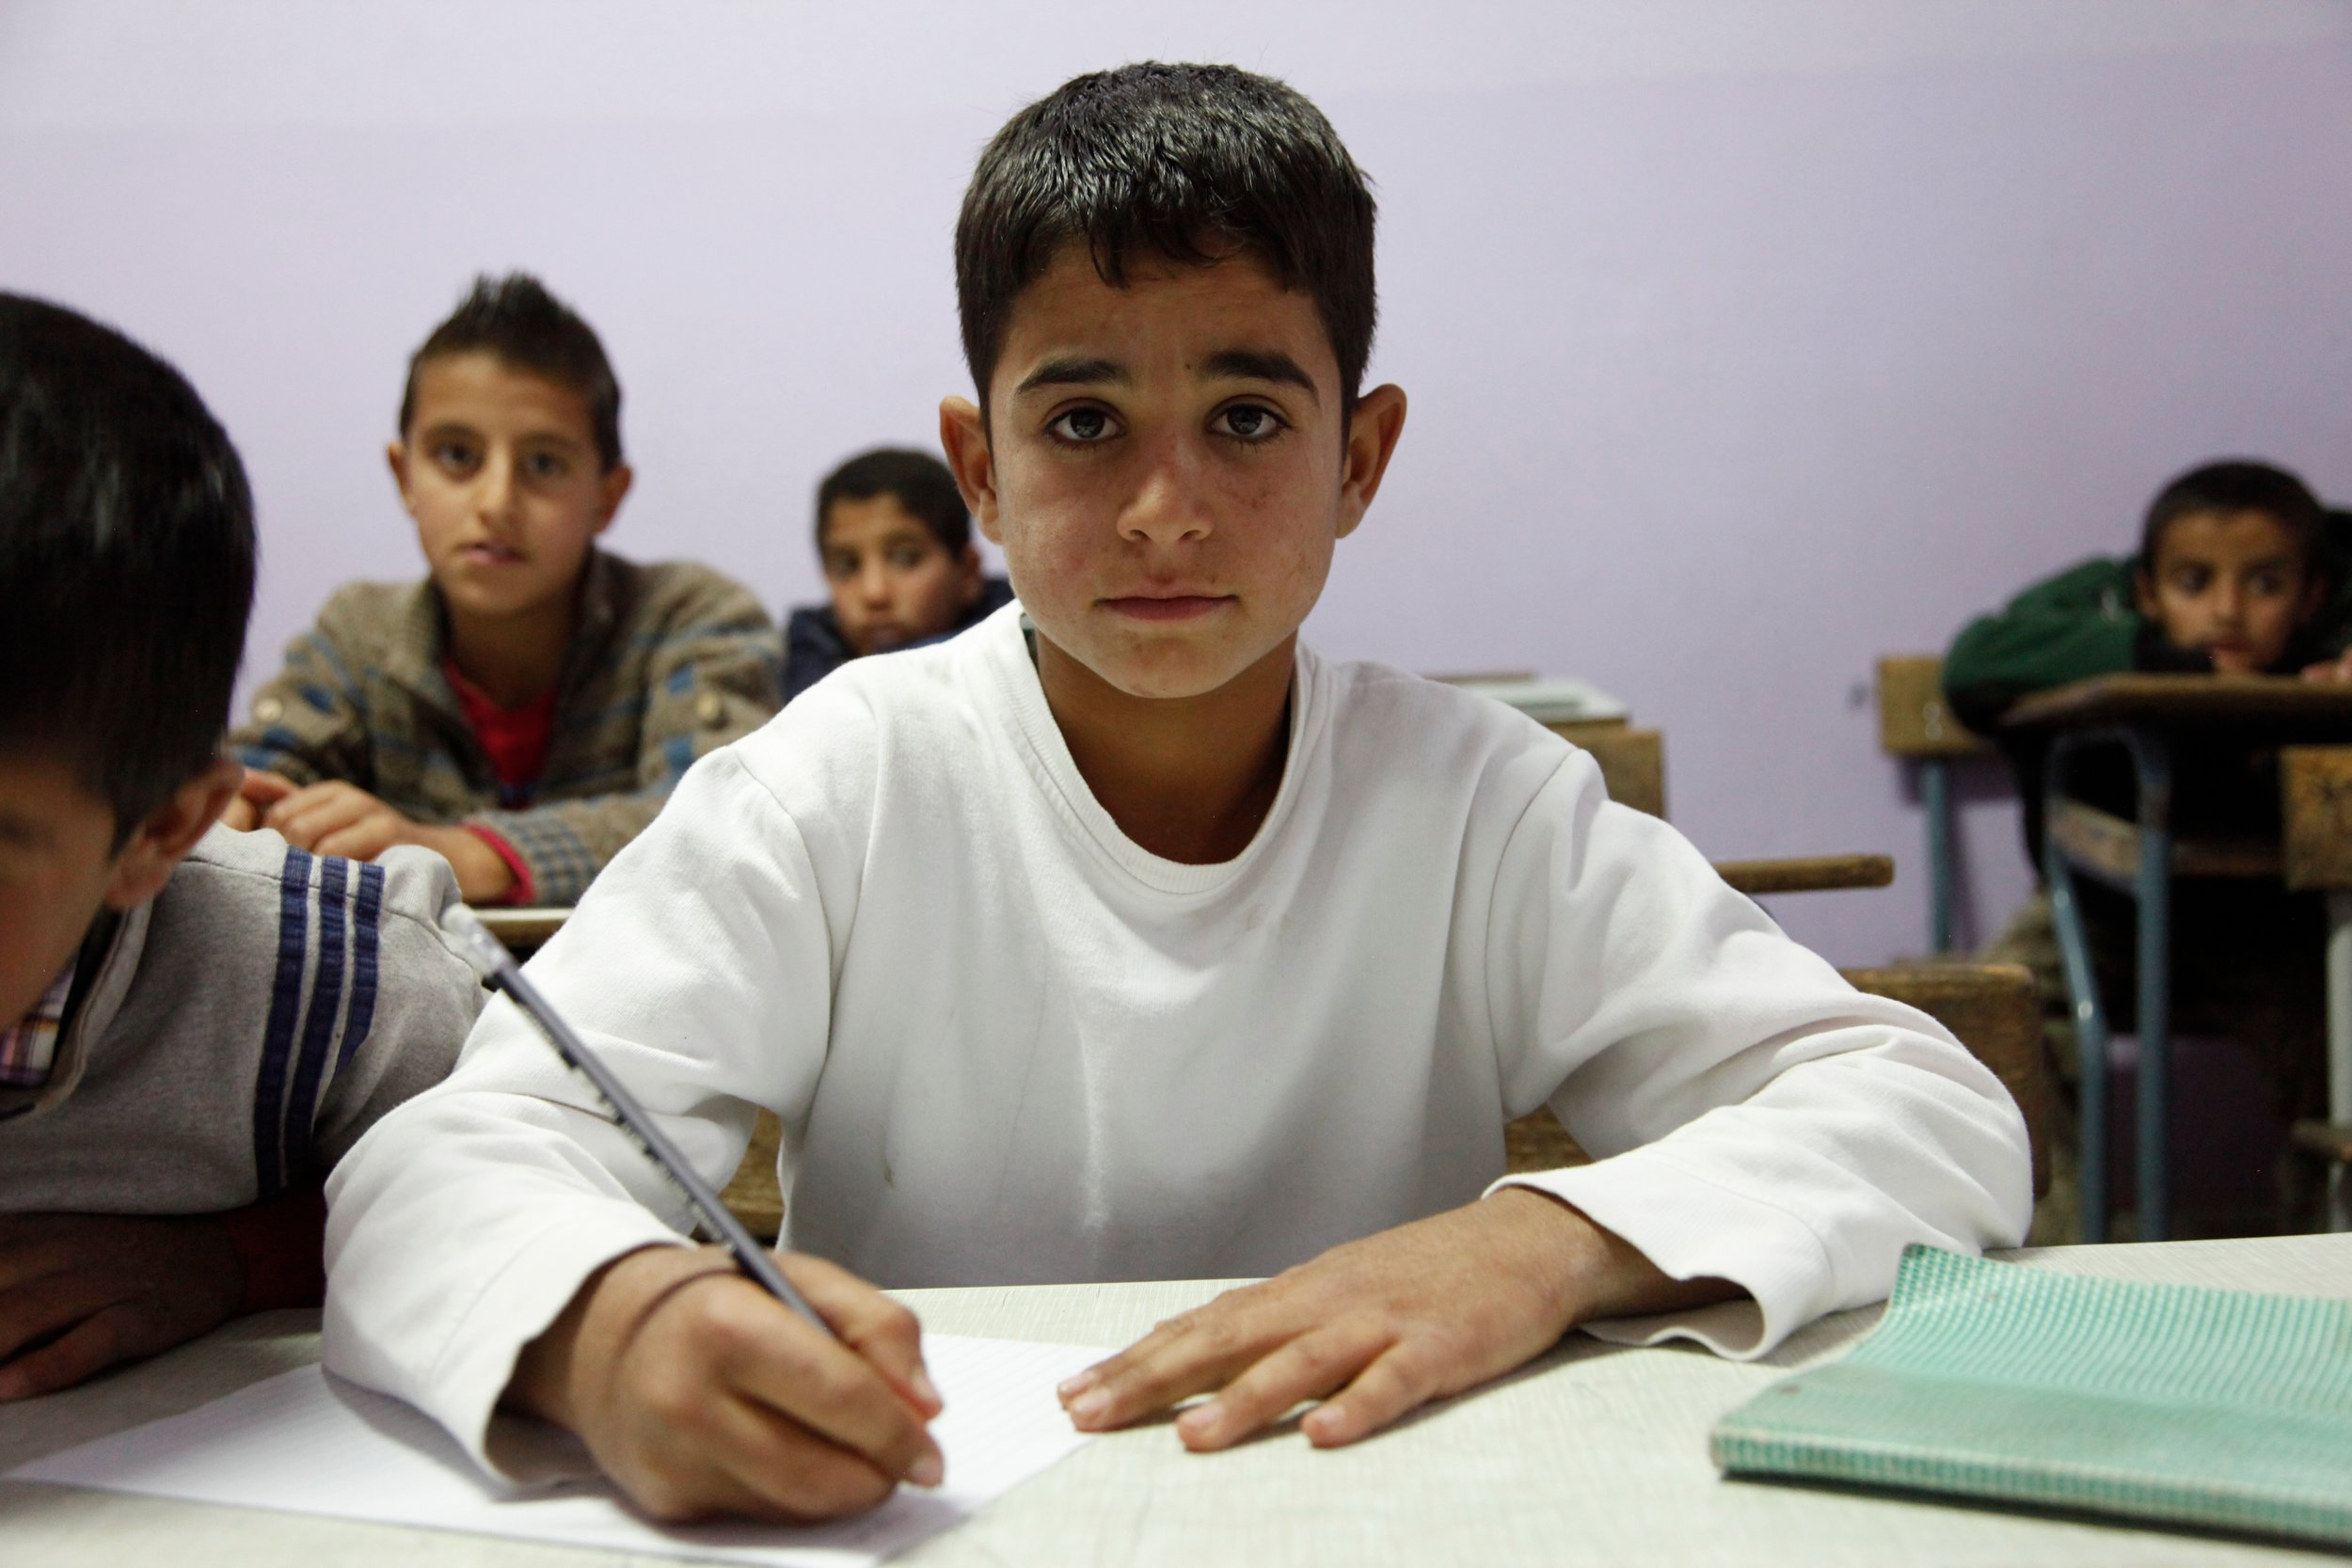 Getting_Syrian_children_back_to_school_in_Lebanon_(11174110673).jpg